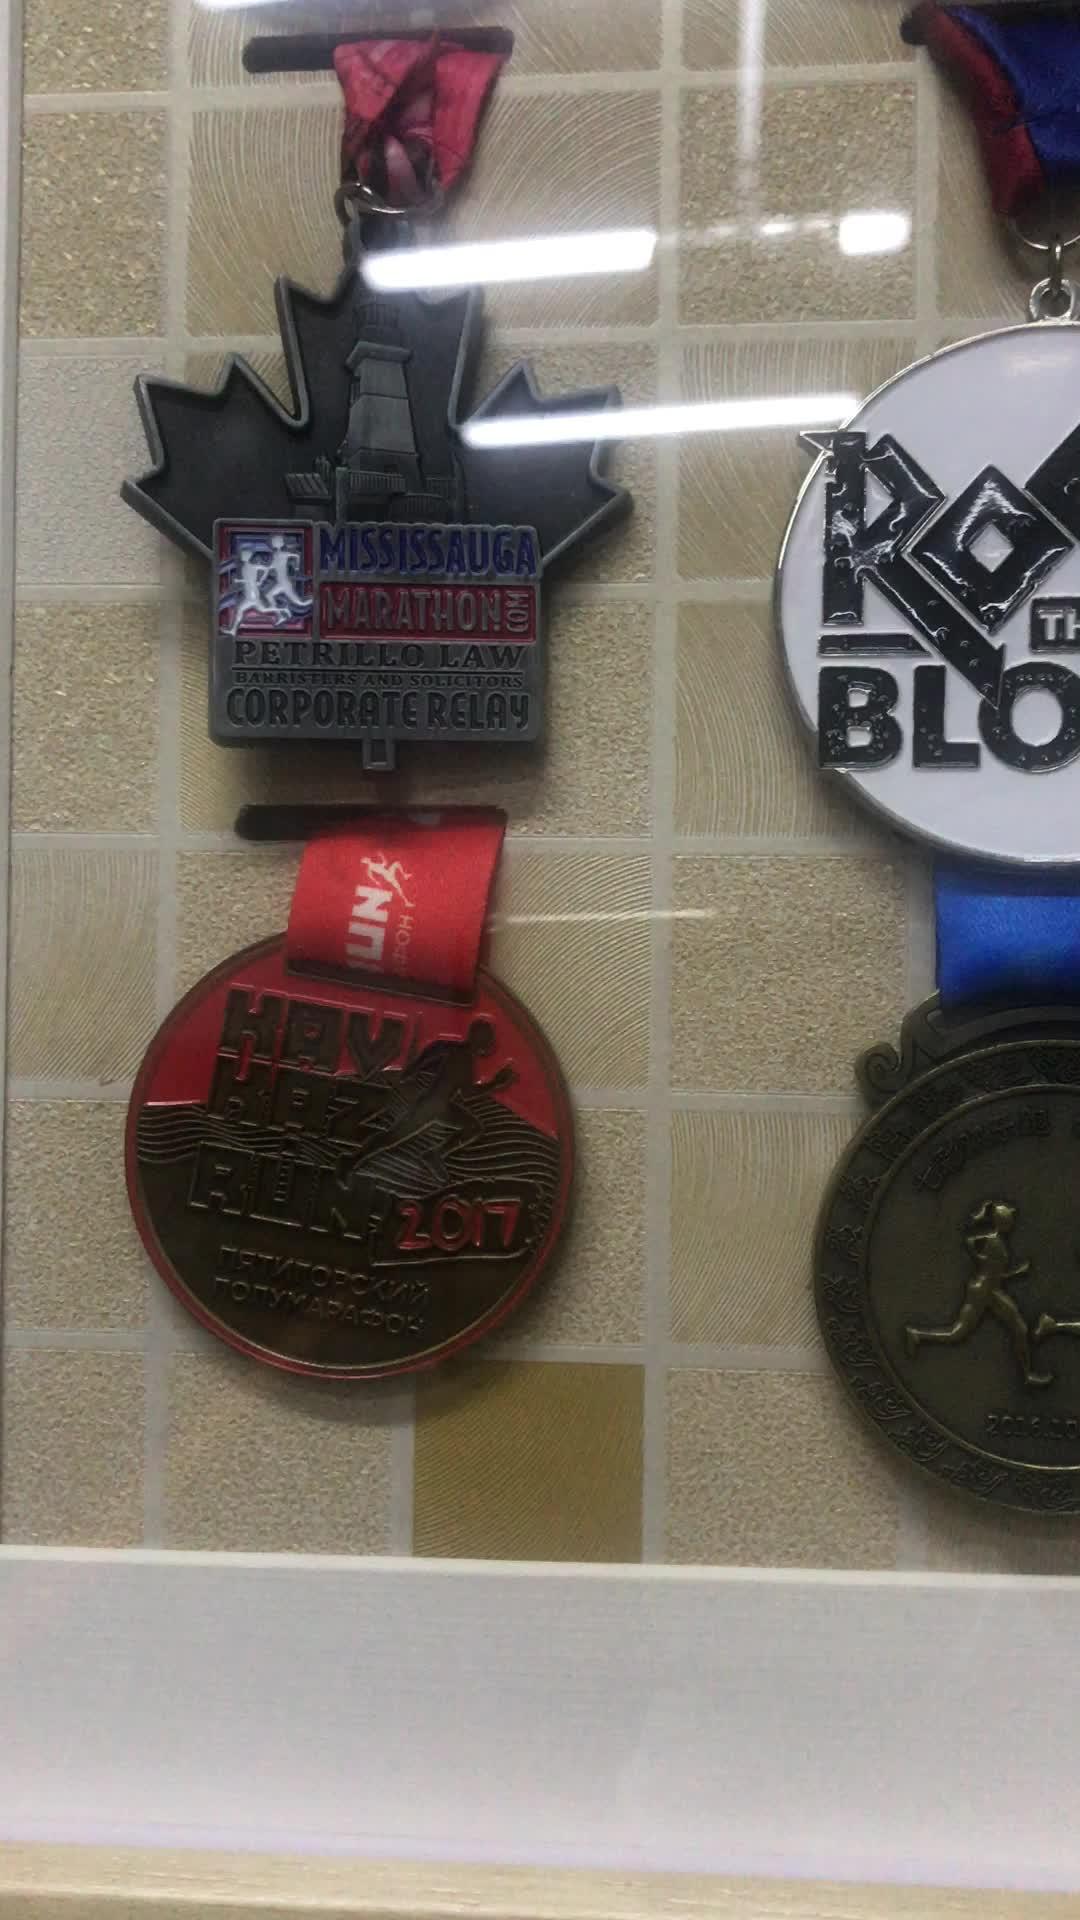 Custom metal football medal marathon sport award with lanyard